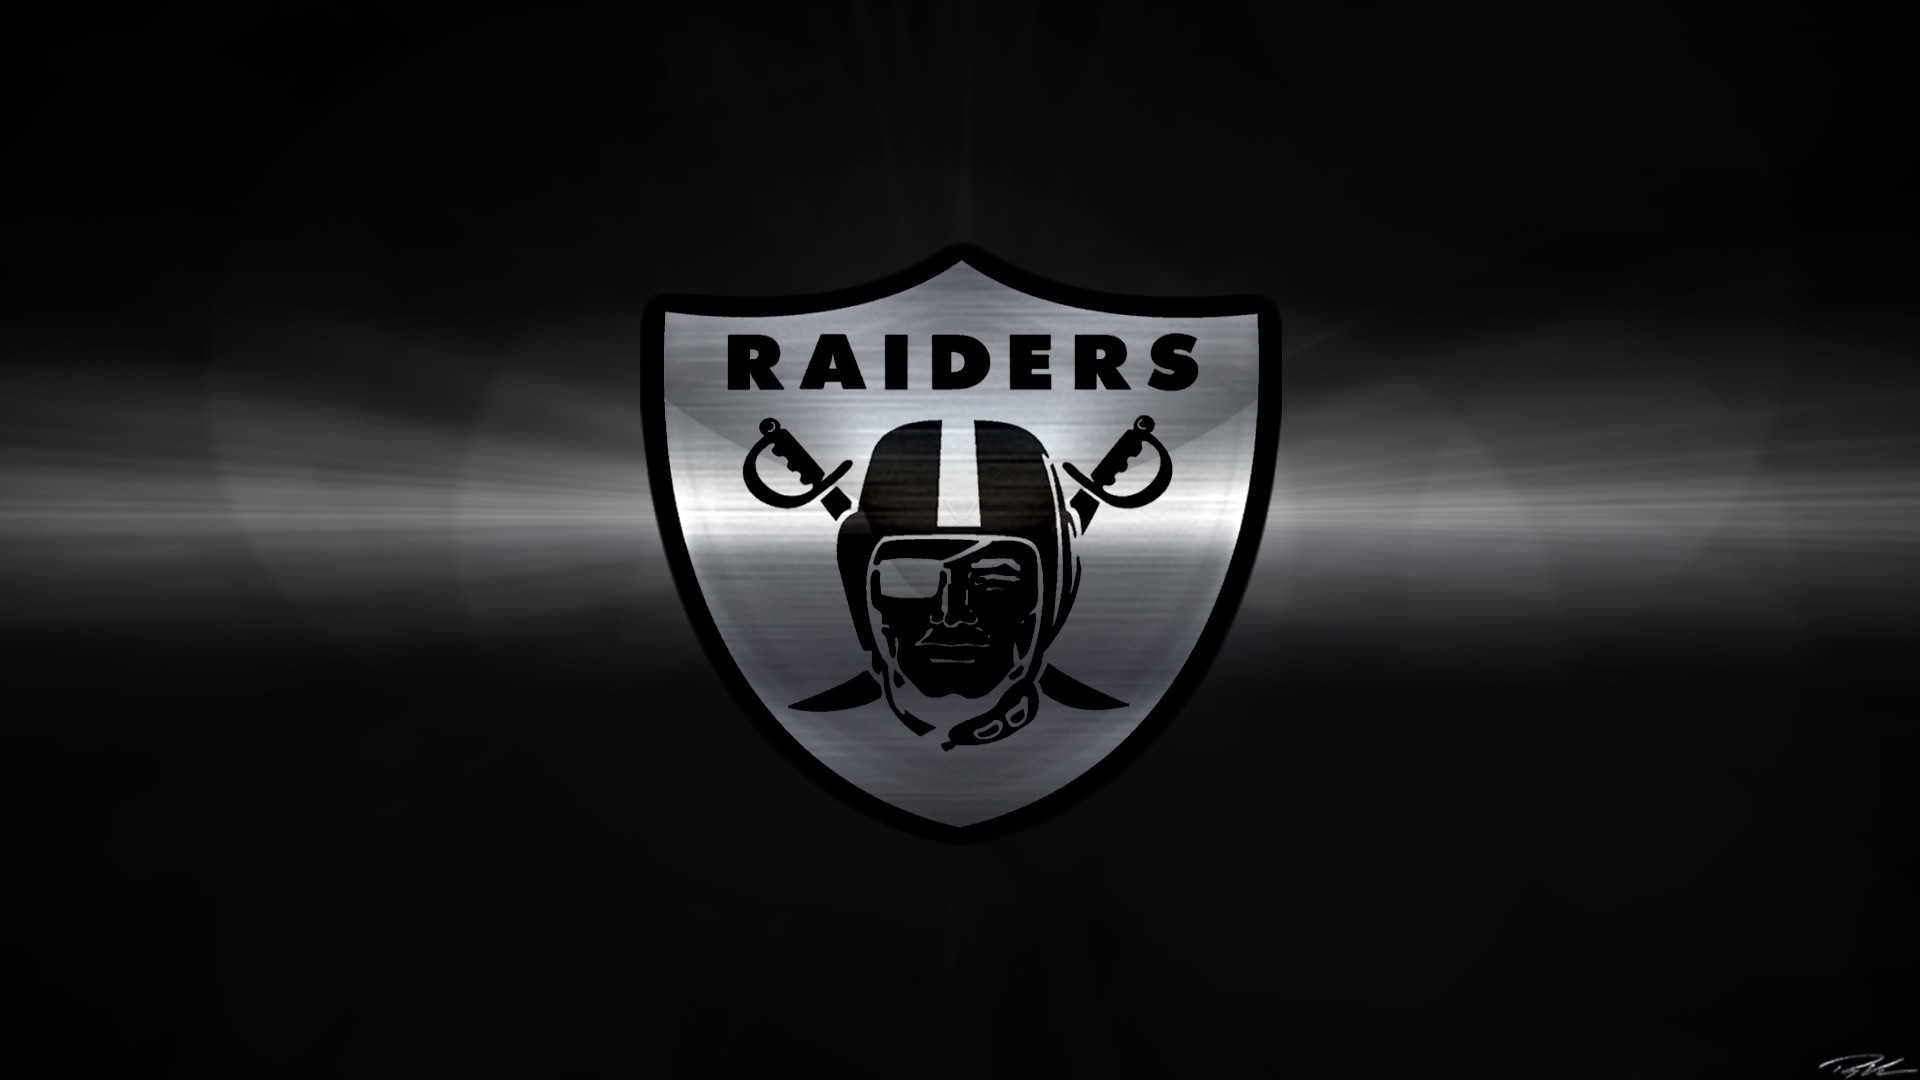 "2592x1900 Full Hd Of Oakland Raiders Wallpaper Nfl Football Sadic Fh Images ..."">"